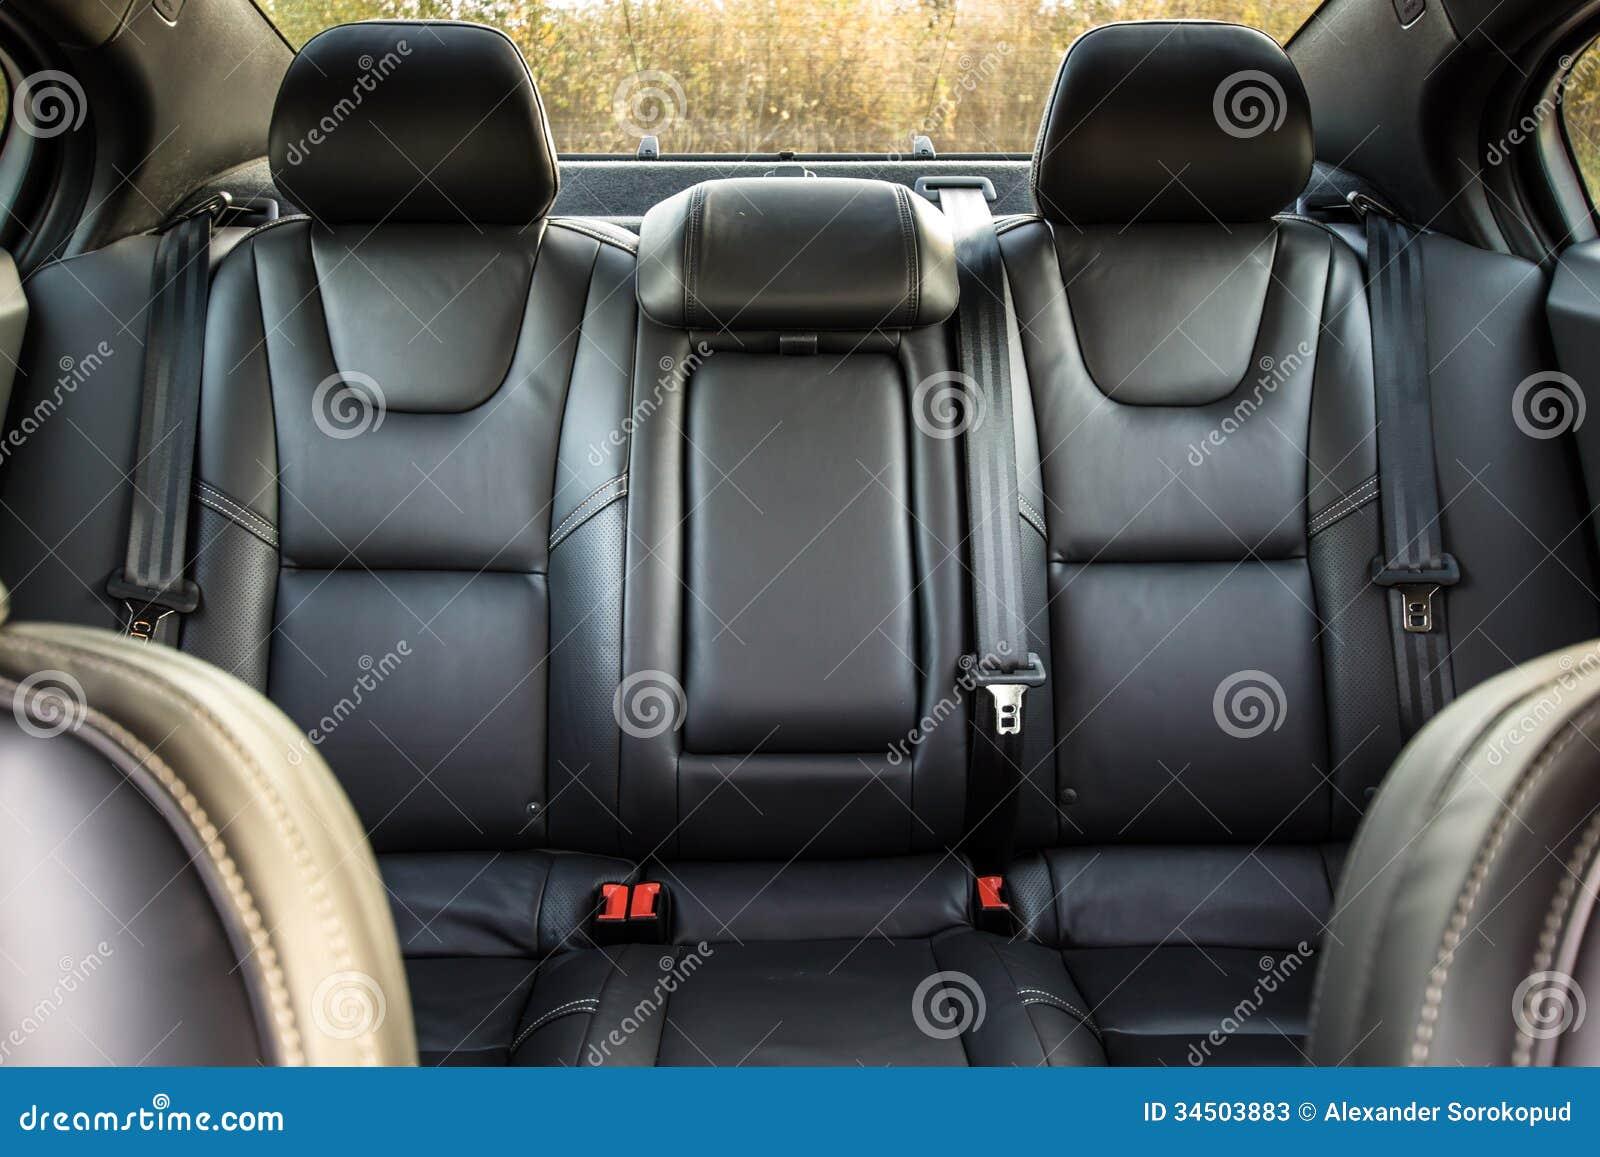 luxury car interior stock image 34503883. Black Bedroom Furniture Sets. Home Design Ideas